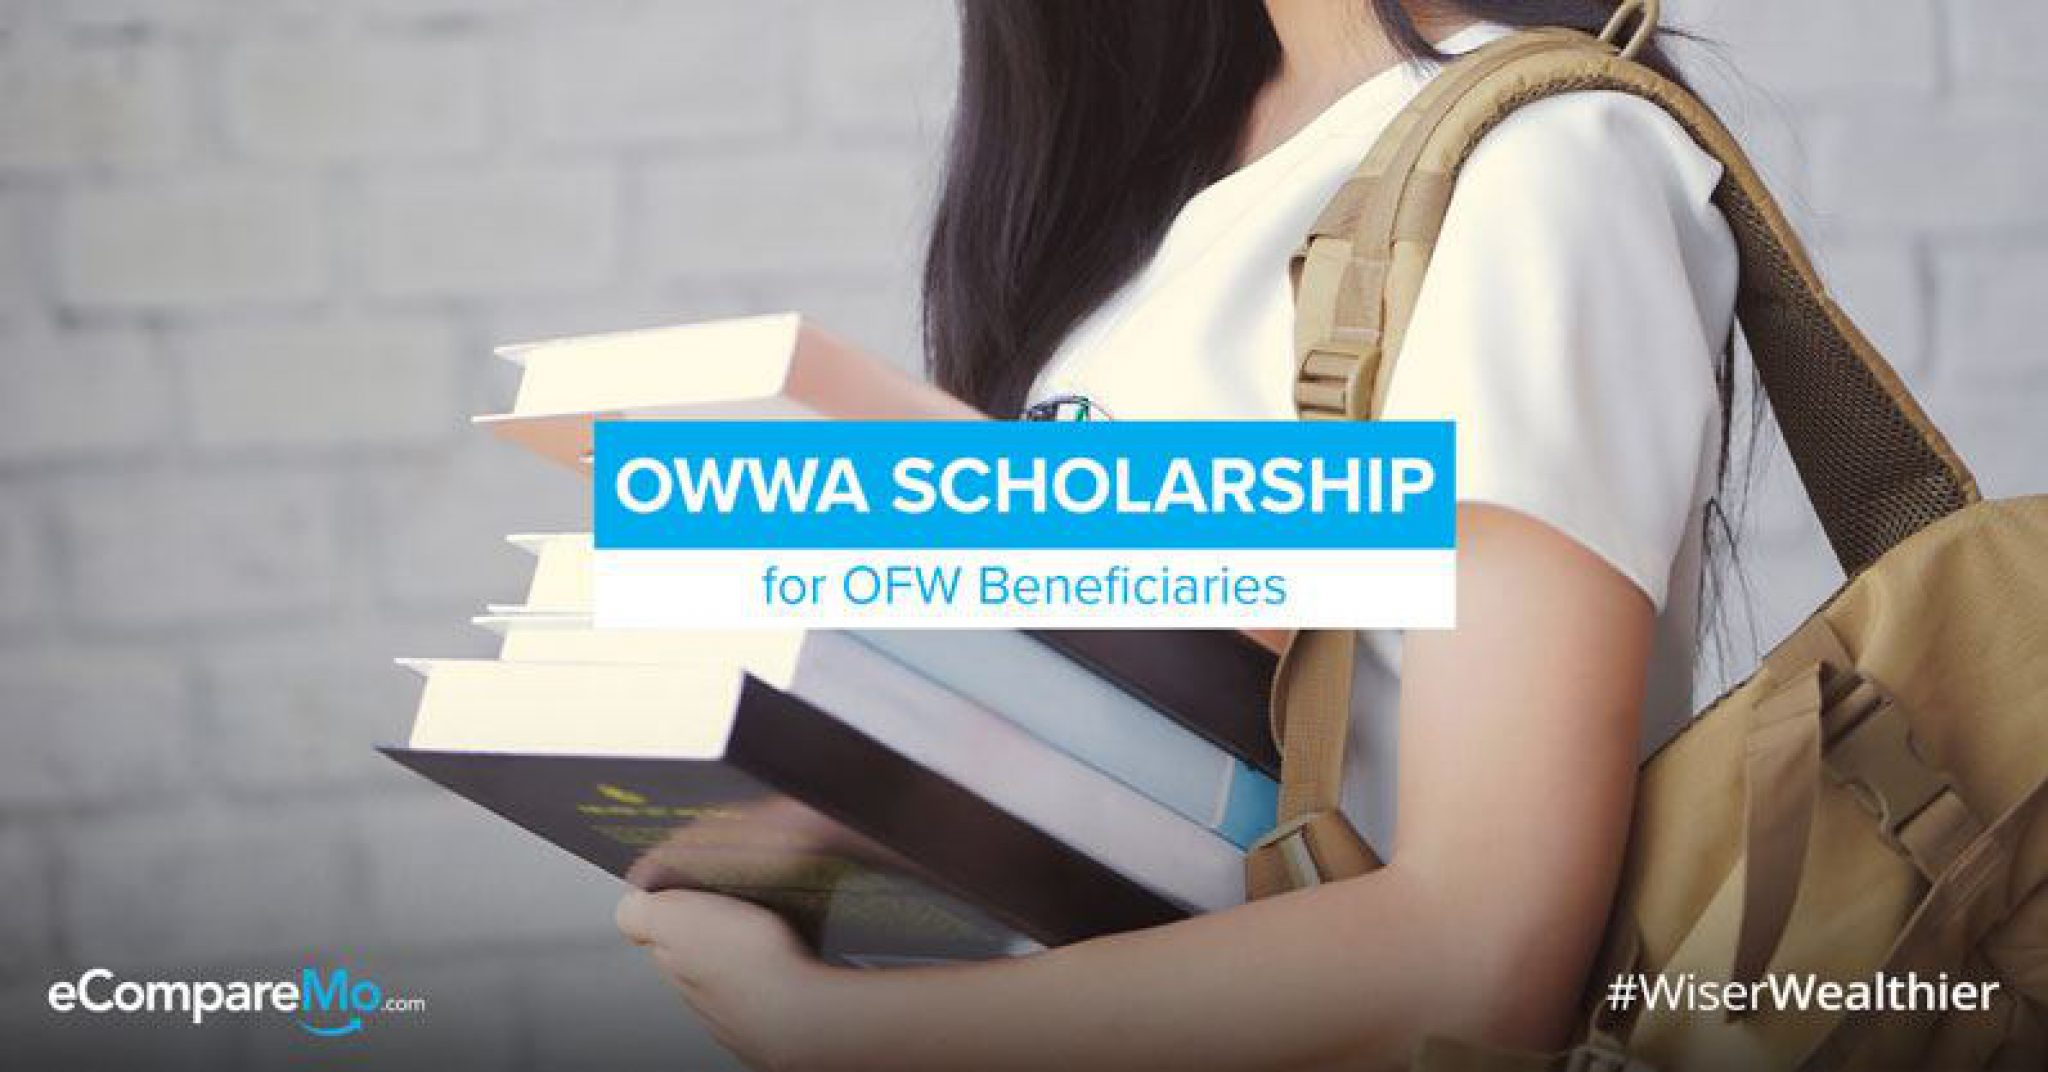 OWWA scholarship for OFW beneficiaries